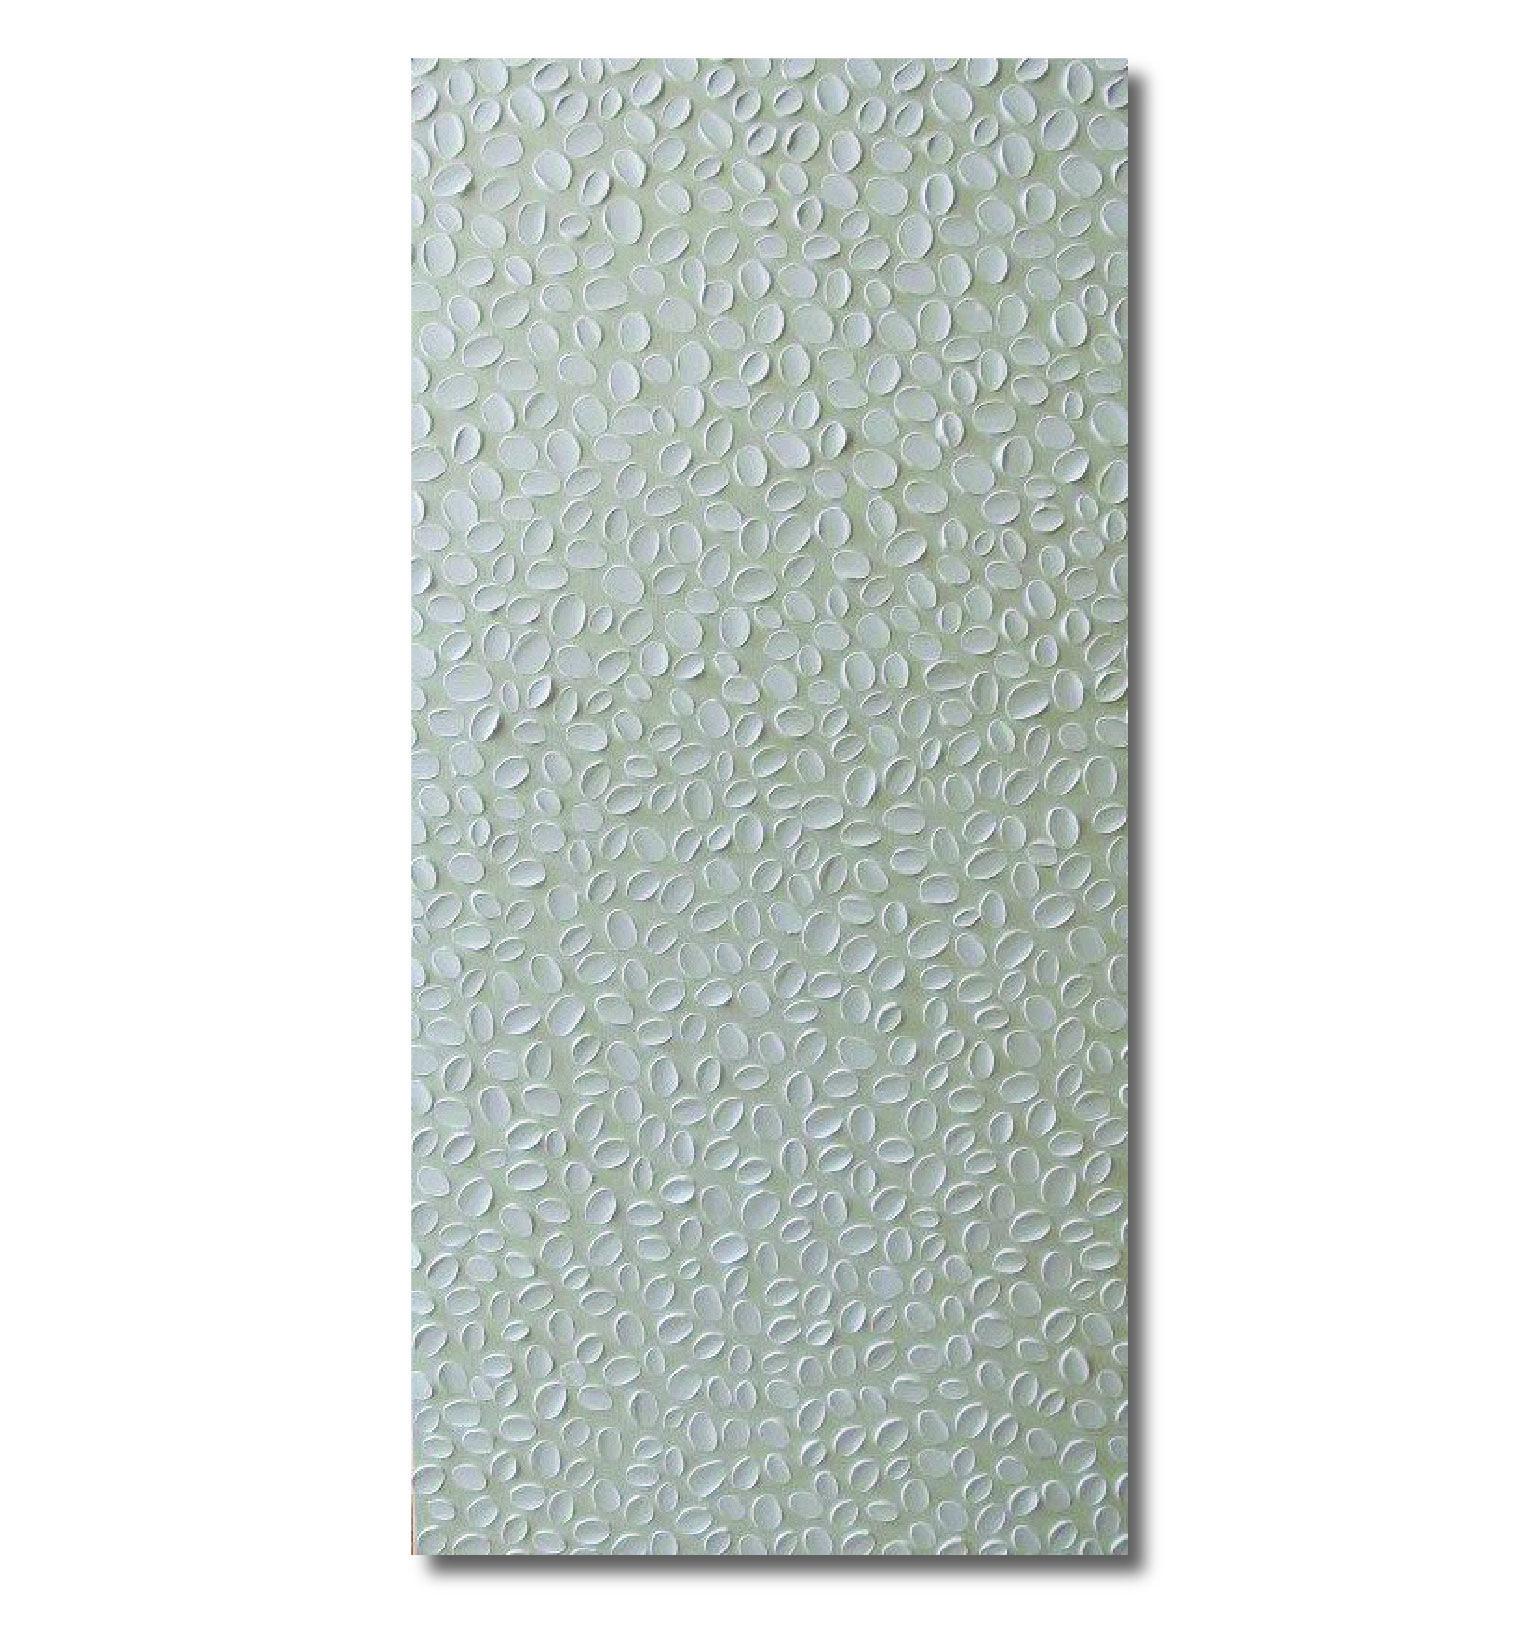 "White Ovals on Beige, 12 x 30"" Acrylic on Canvas"